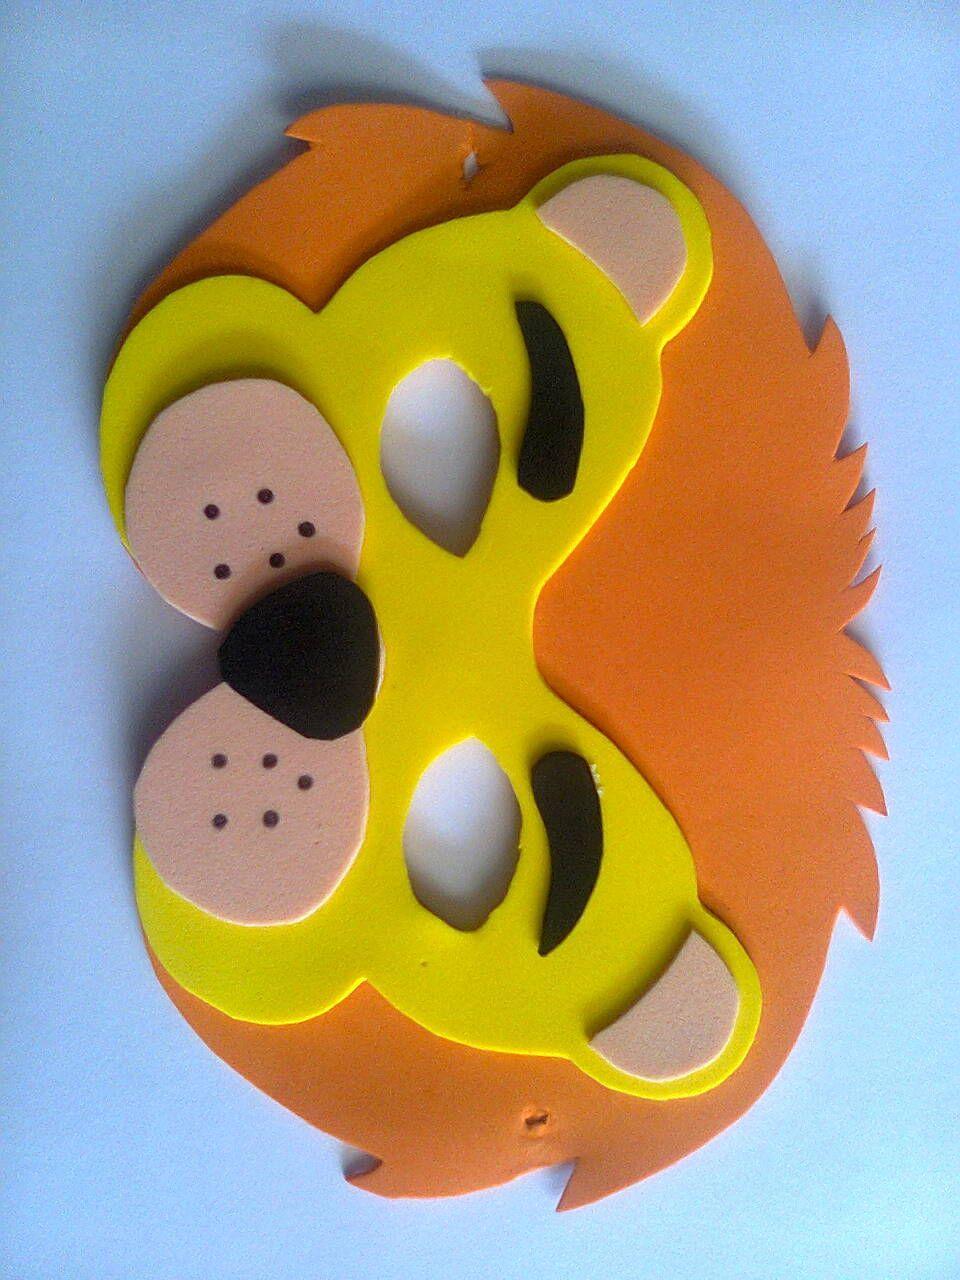 Mascara leon manuali en corrospun y pa o masca - Mascaras para carnaval manualidades ...